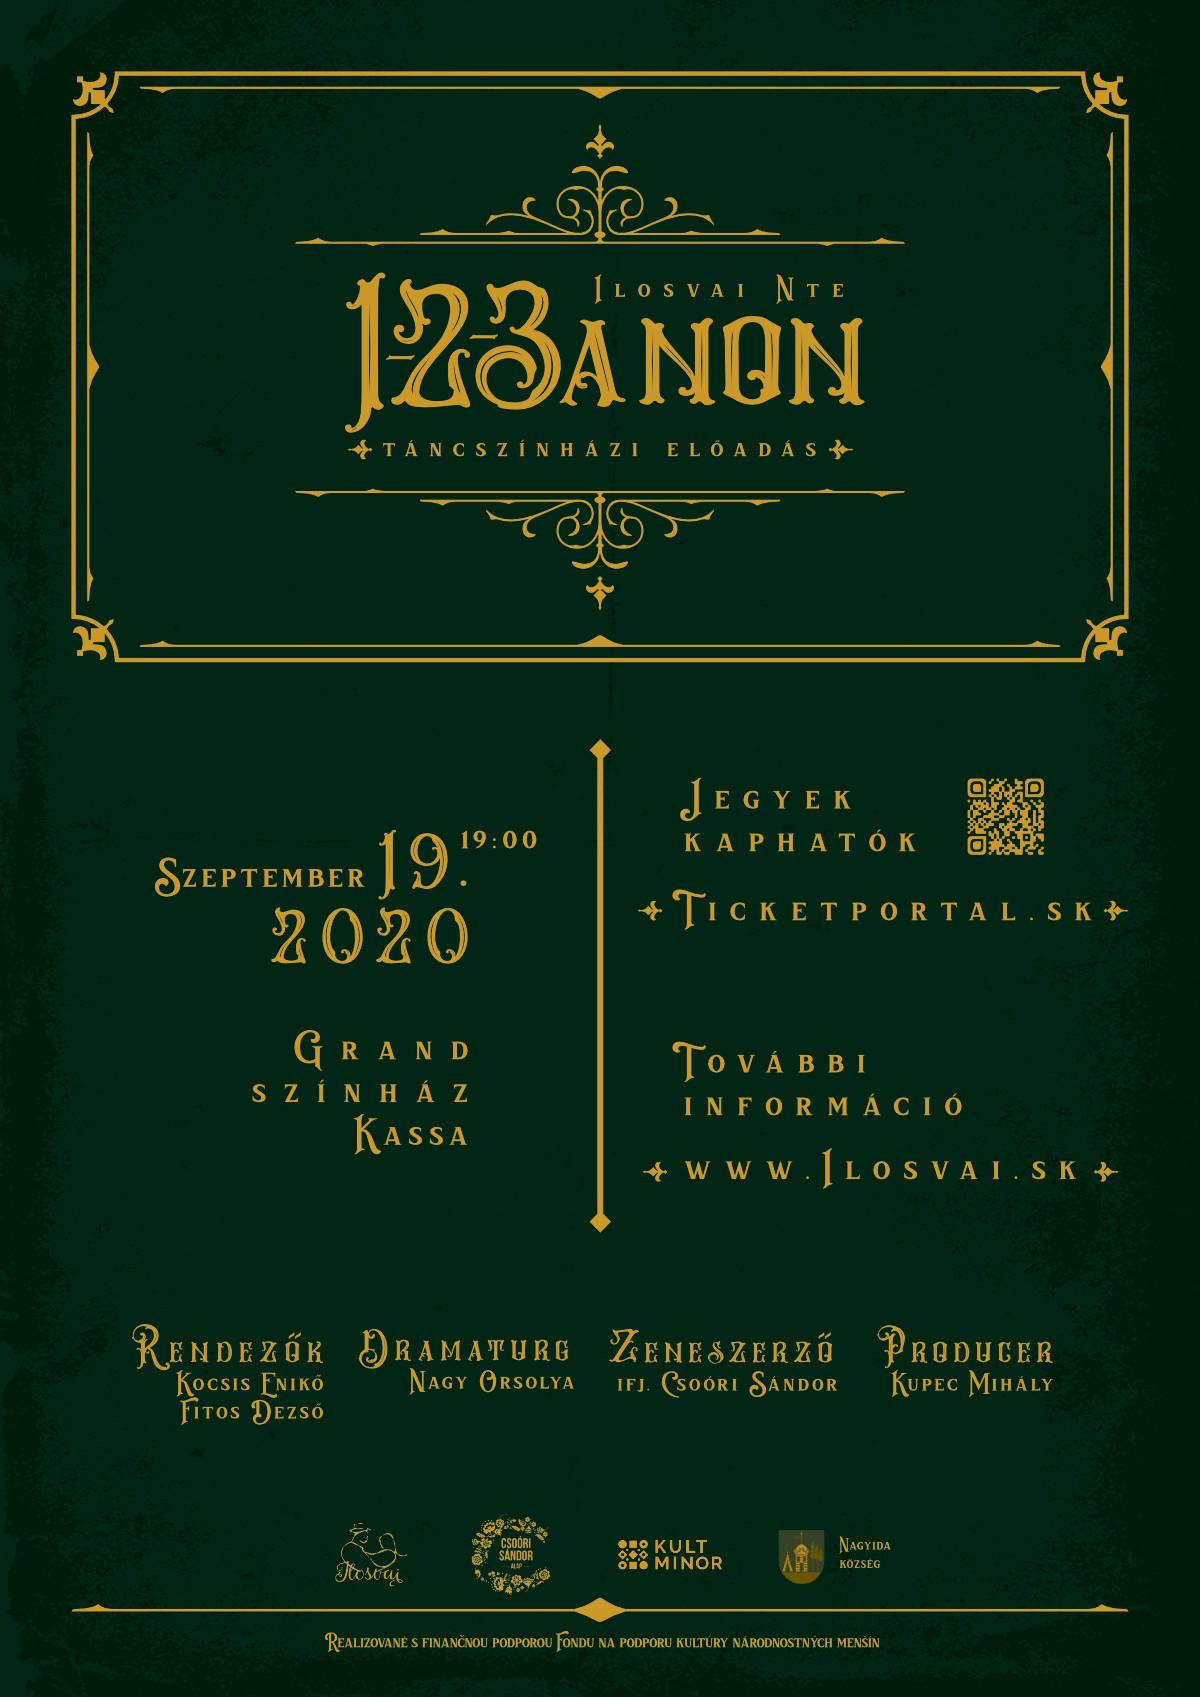 123anon_hu_1